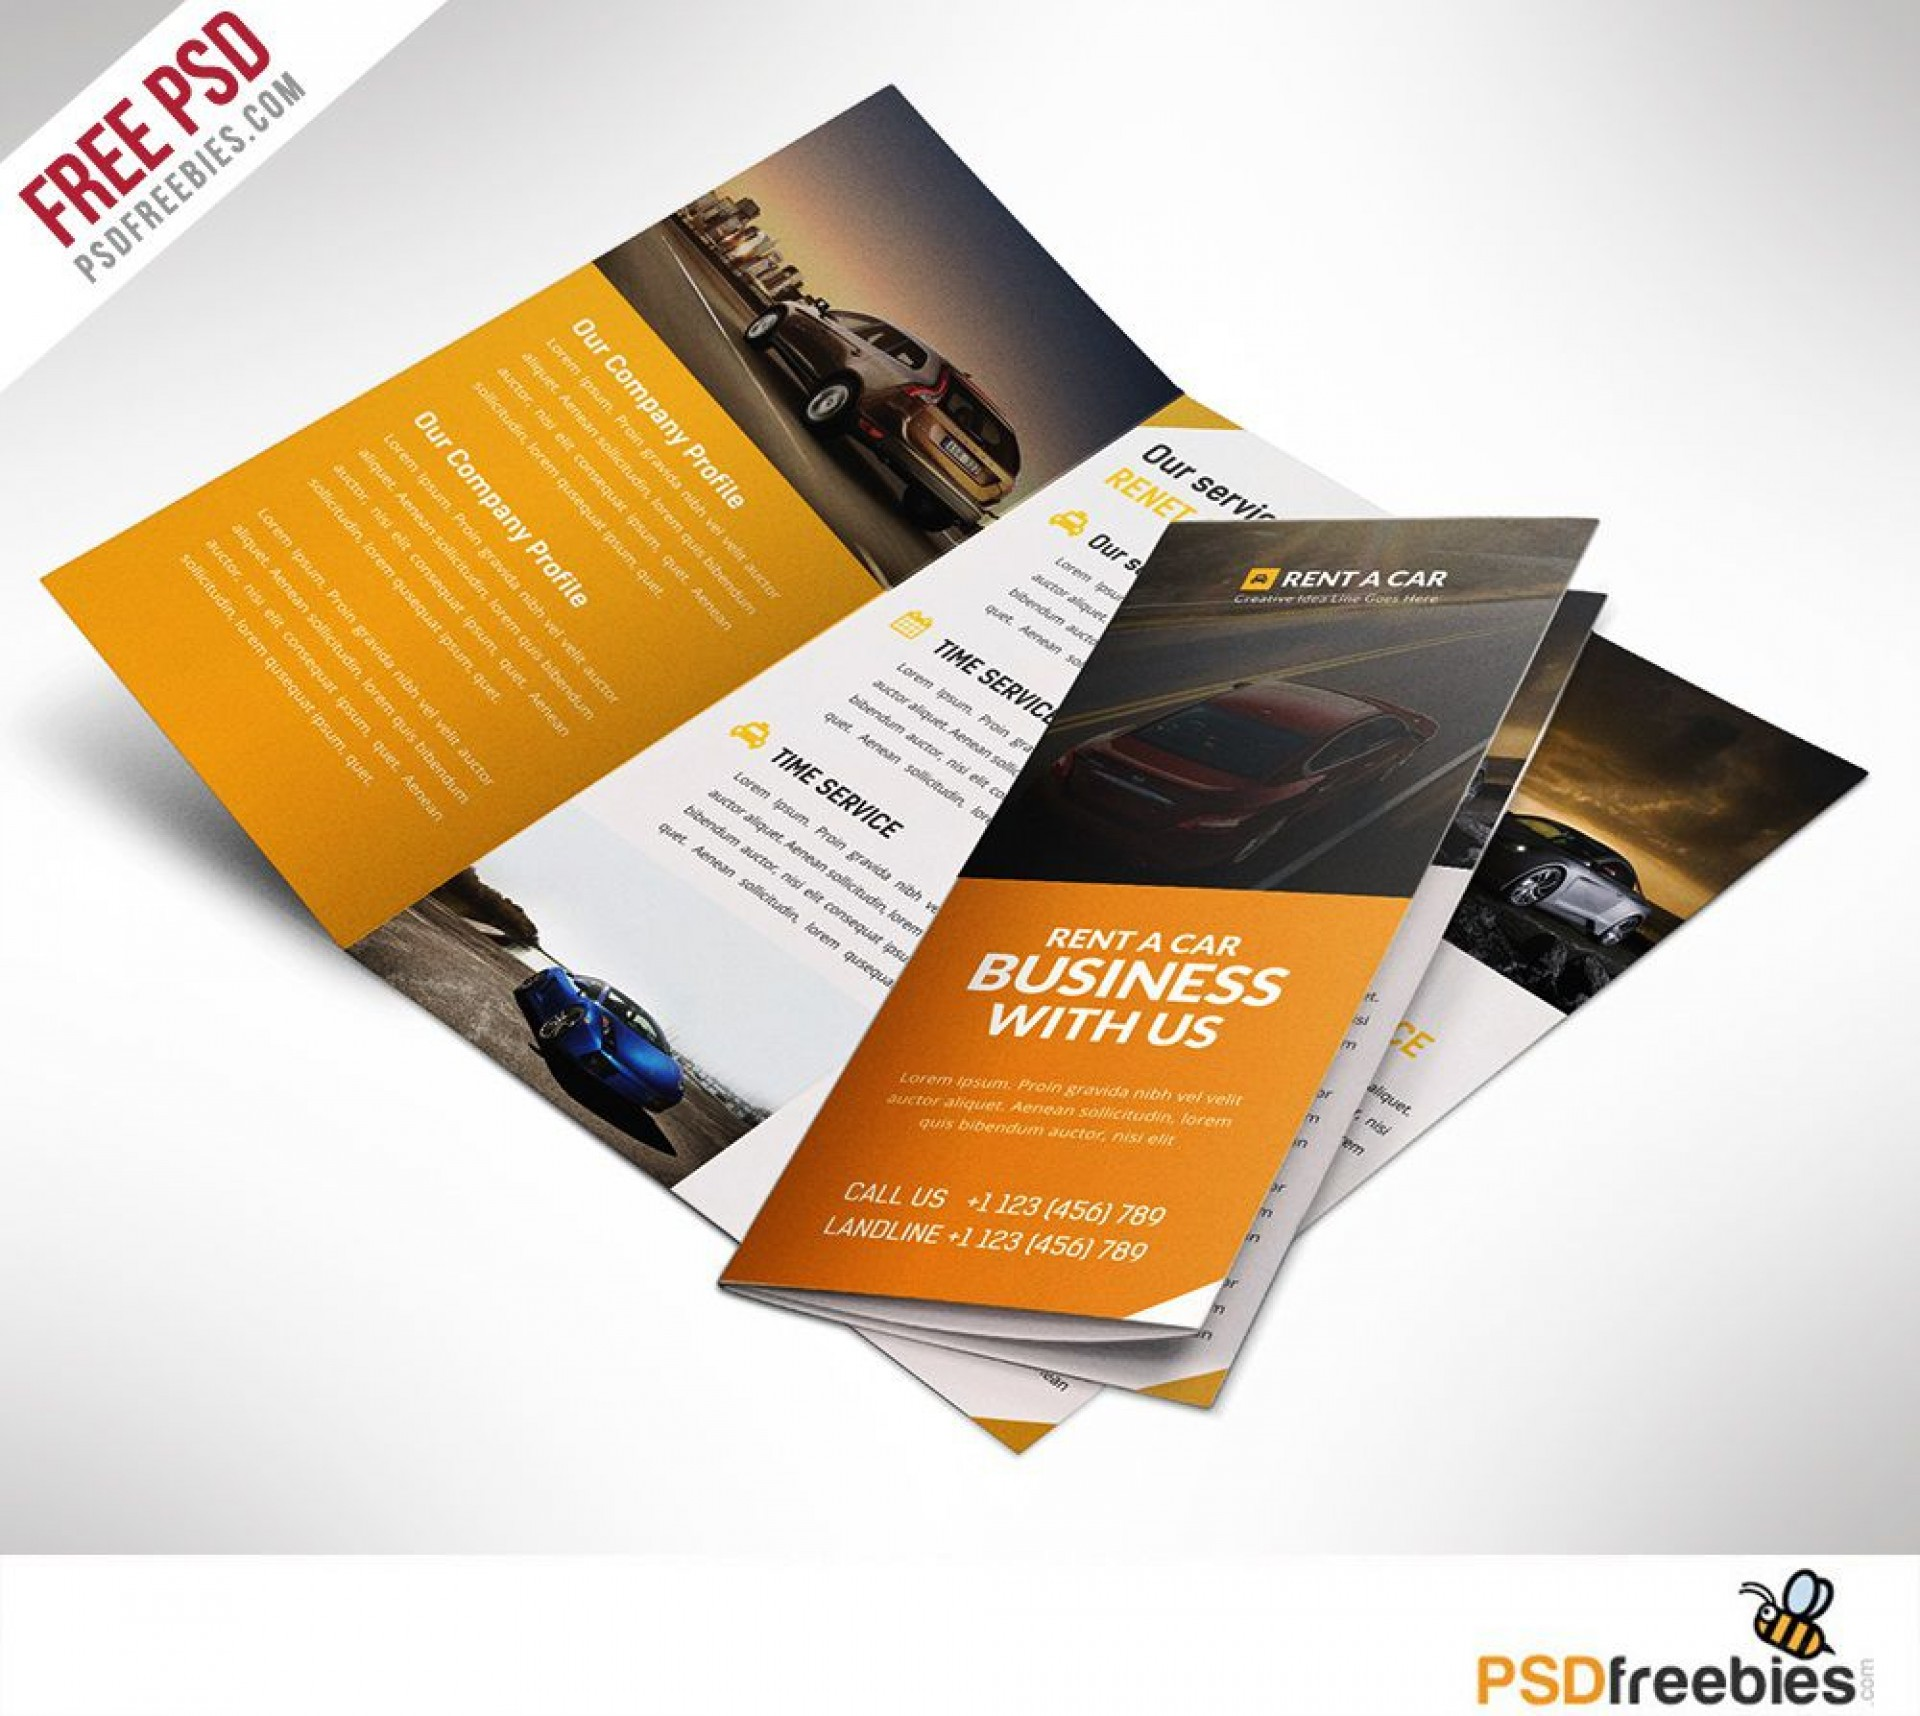 005 Stupendou Free Psd Busines Brochure Template High Definition  Templates Flyer 2018 Corporate1920